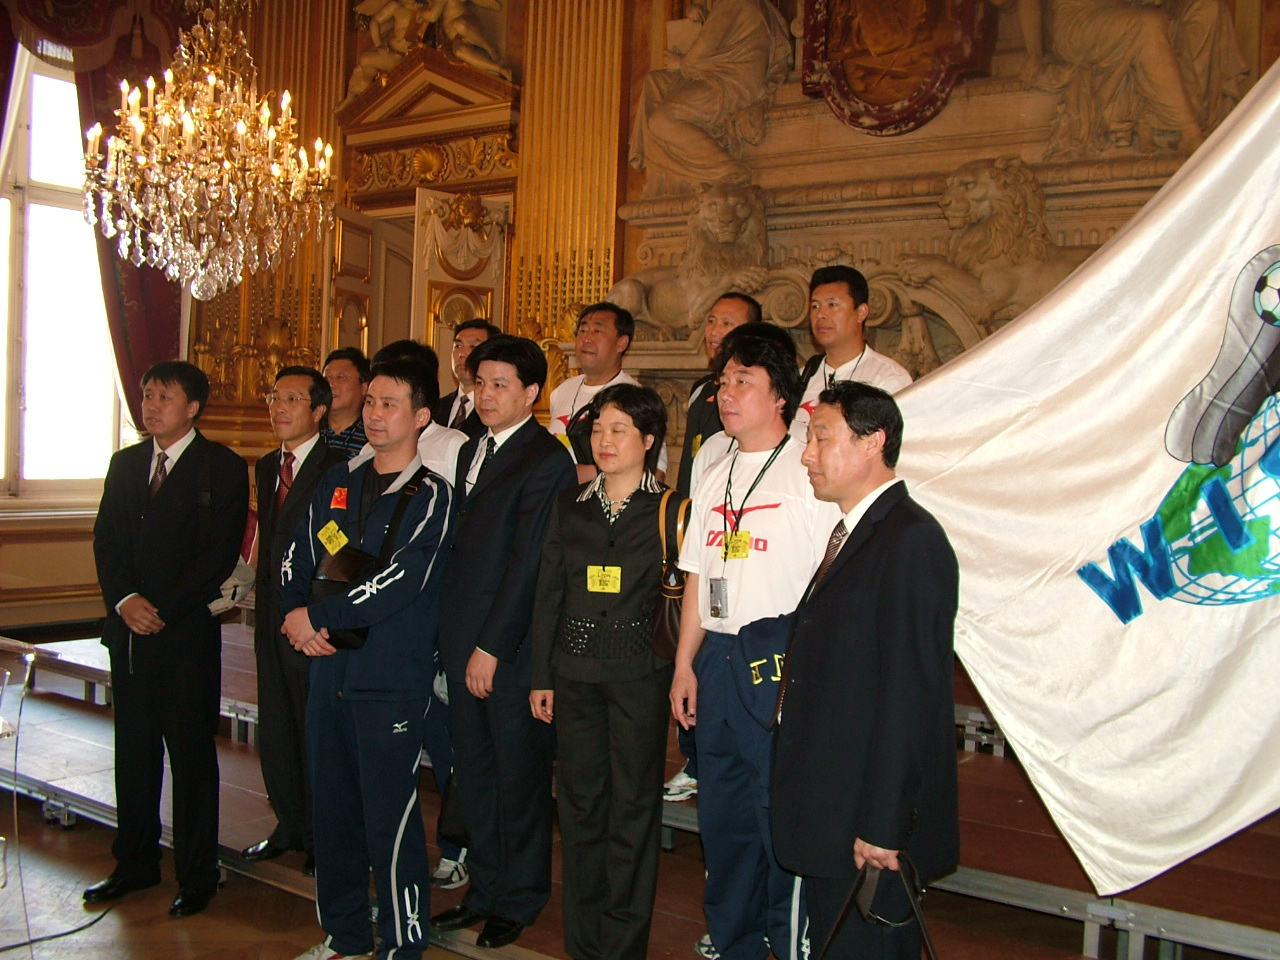 2006 Lyon 2404 139.jpg